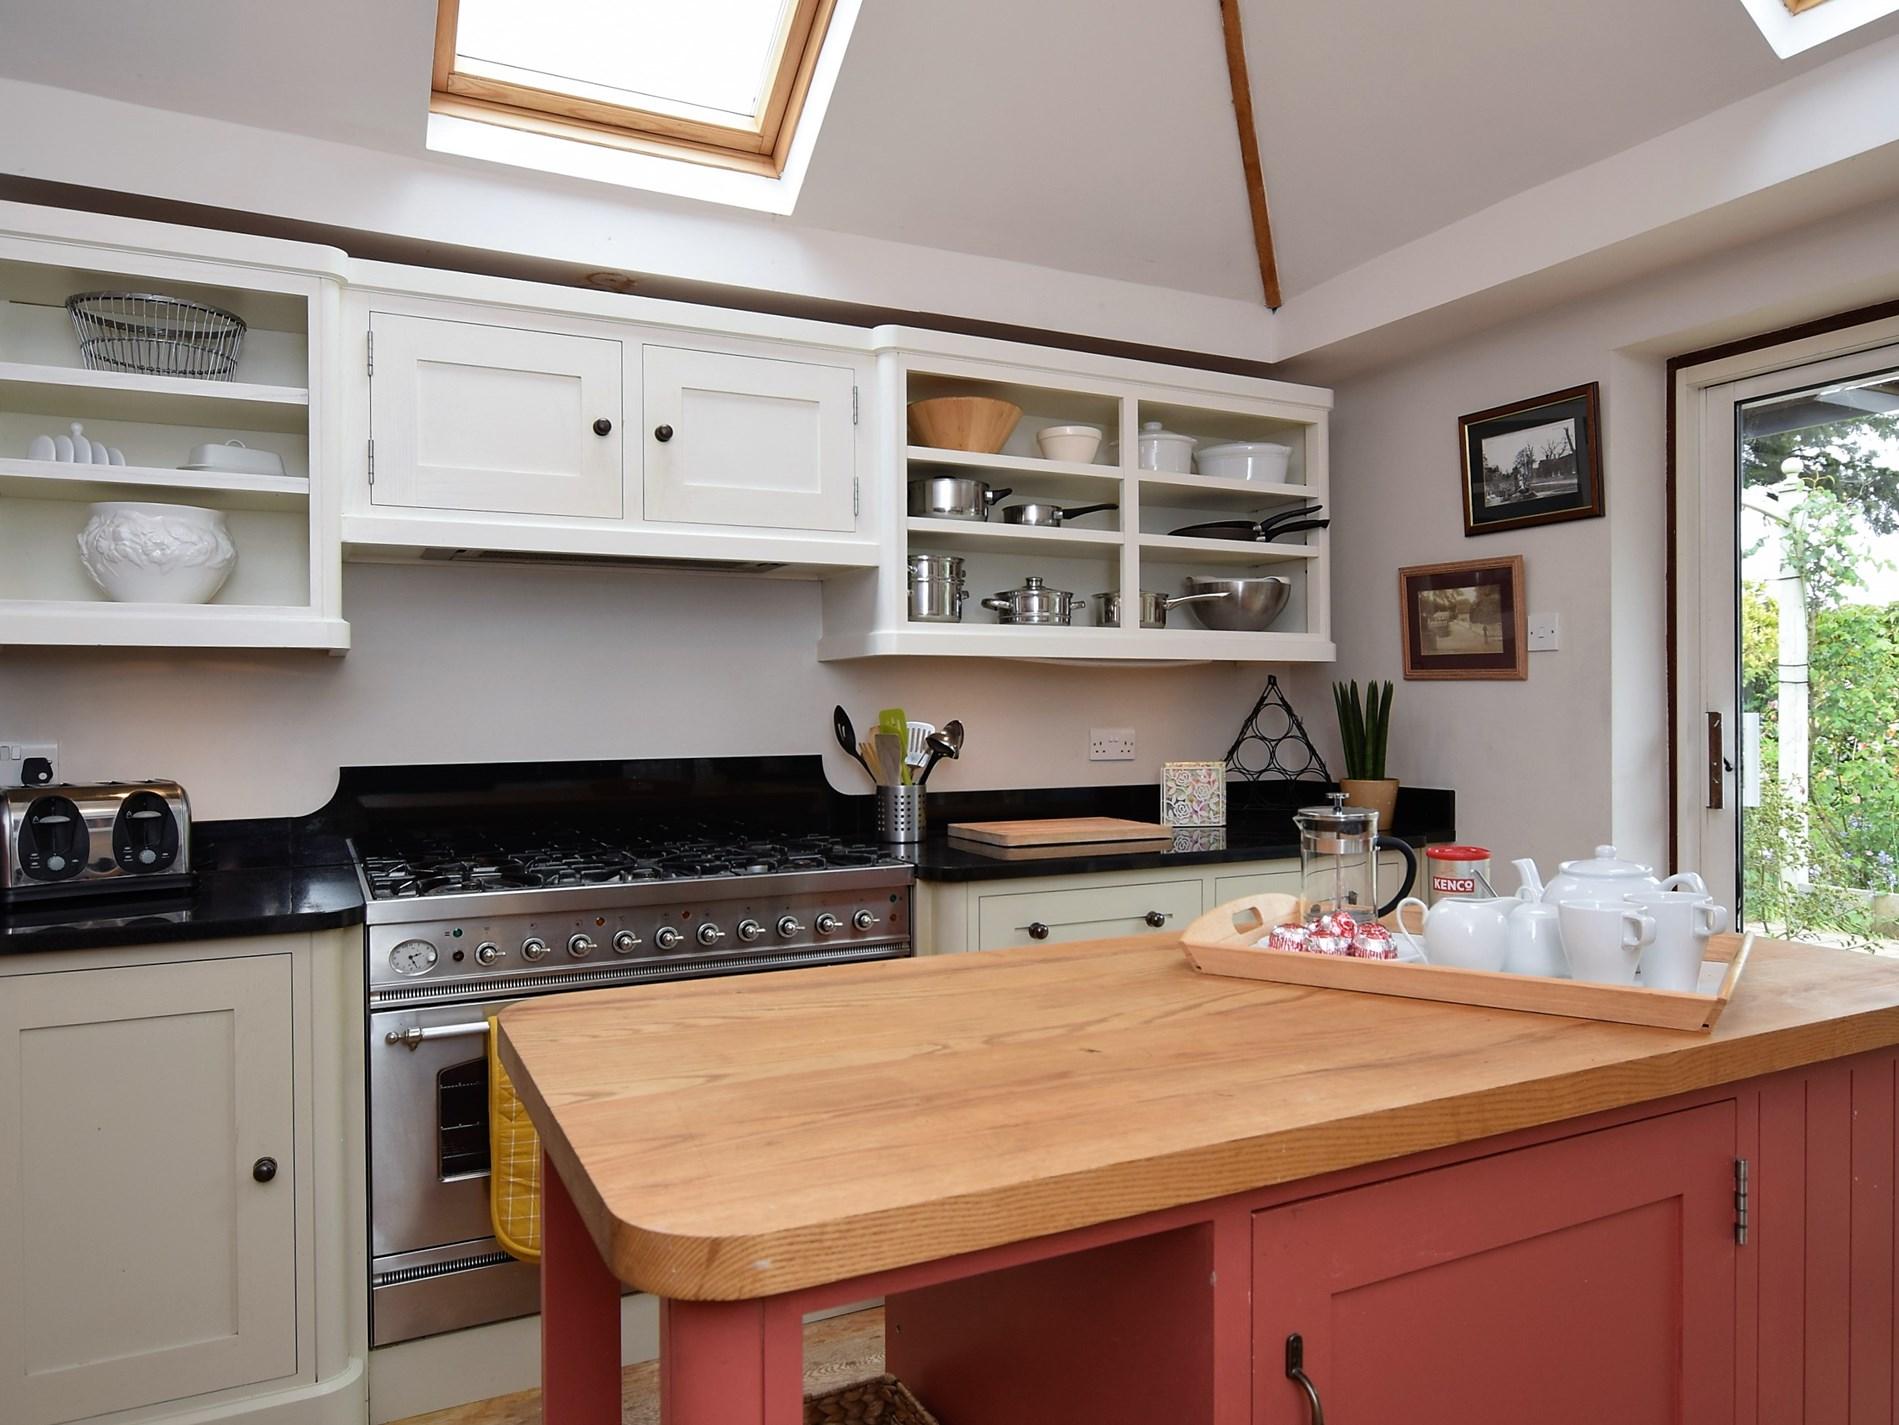 Enjoy preparing meals in the light filled kitchen